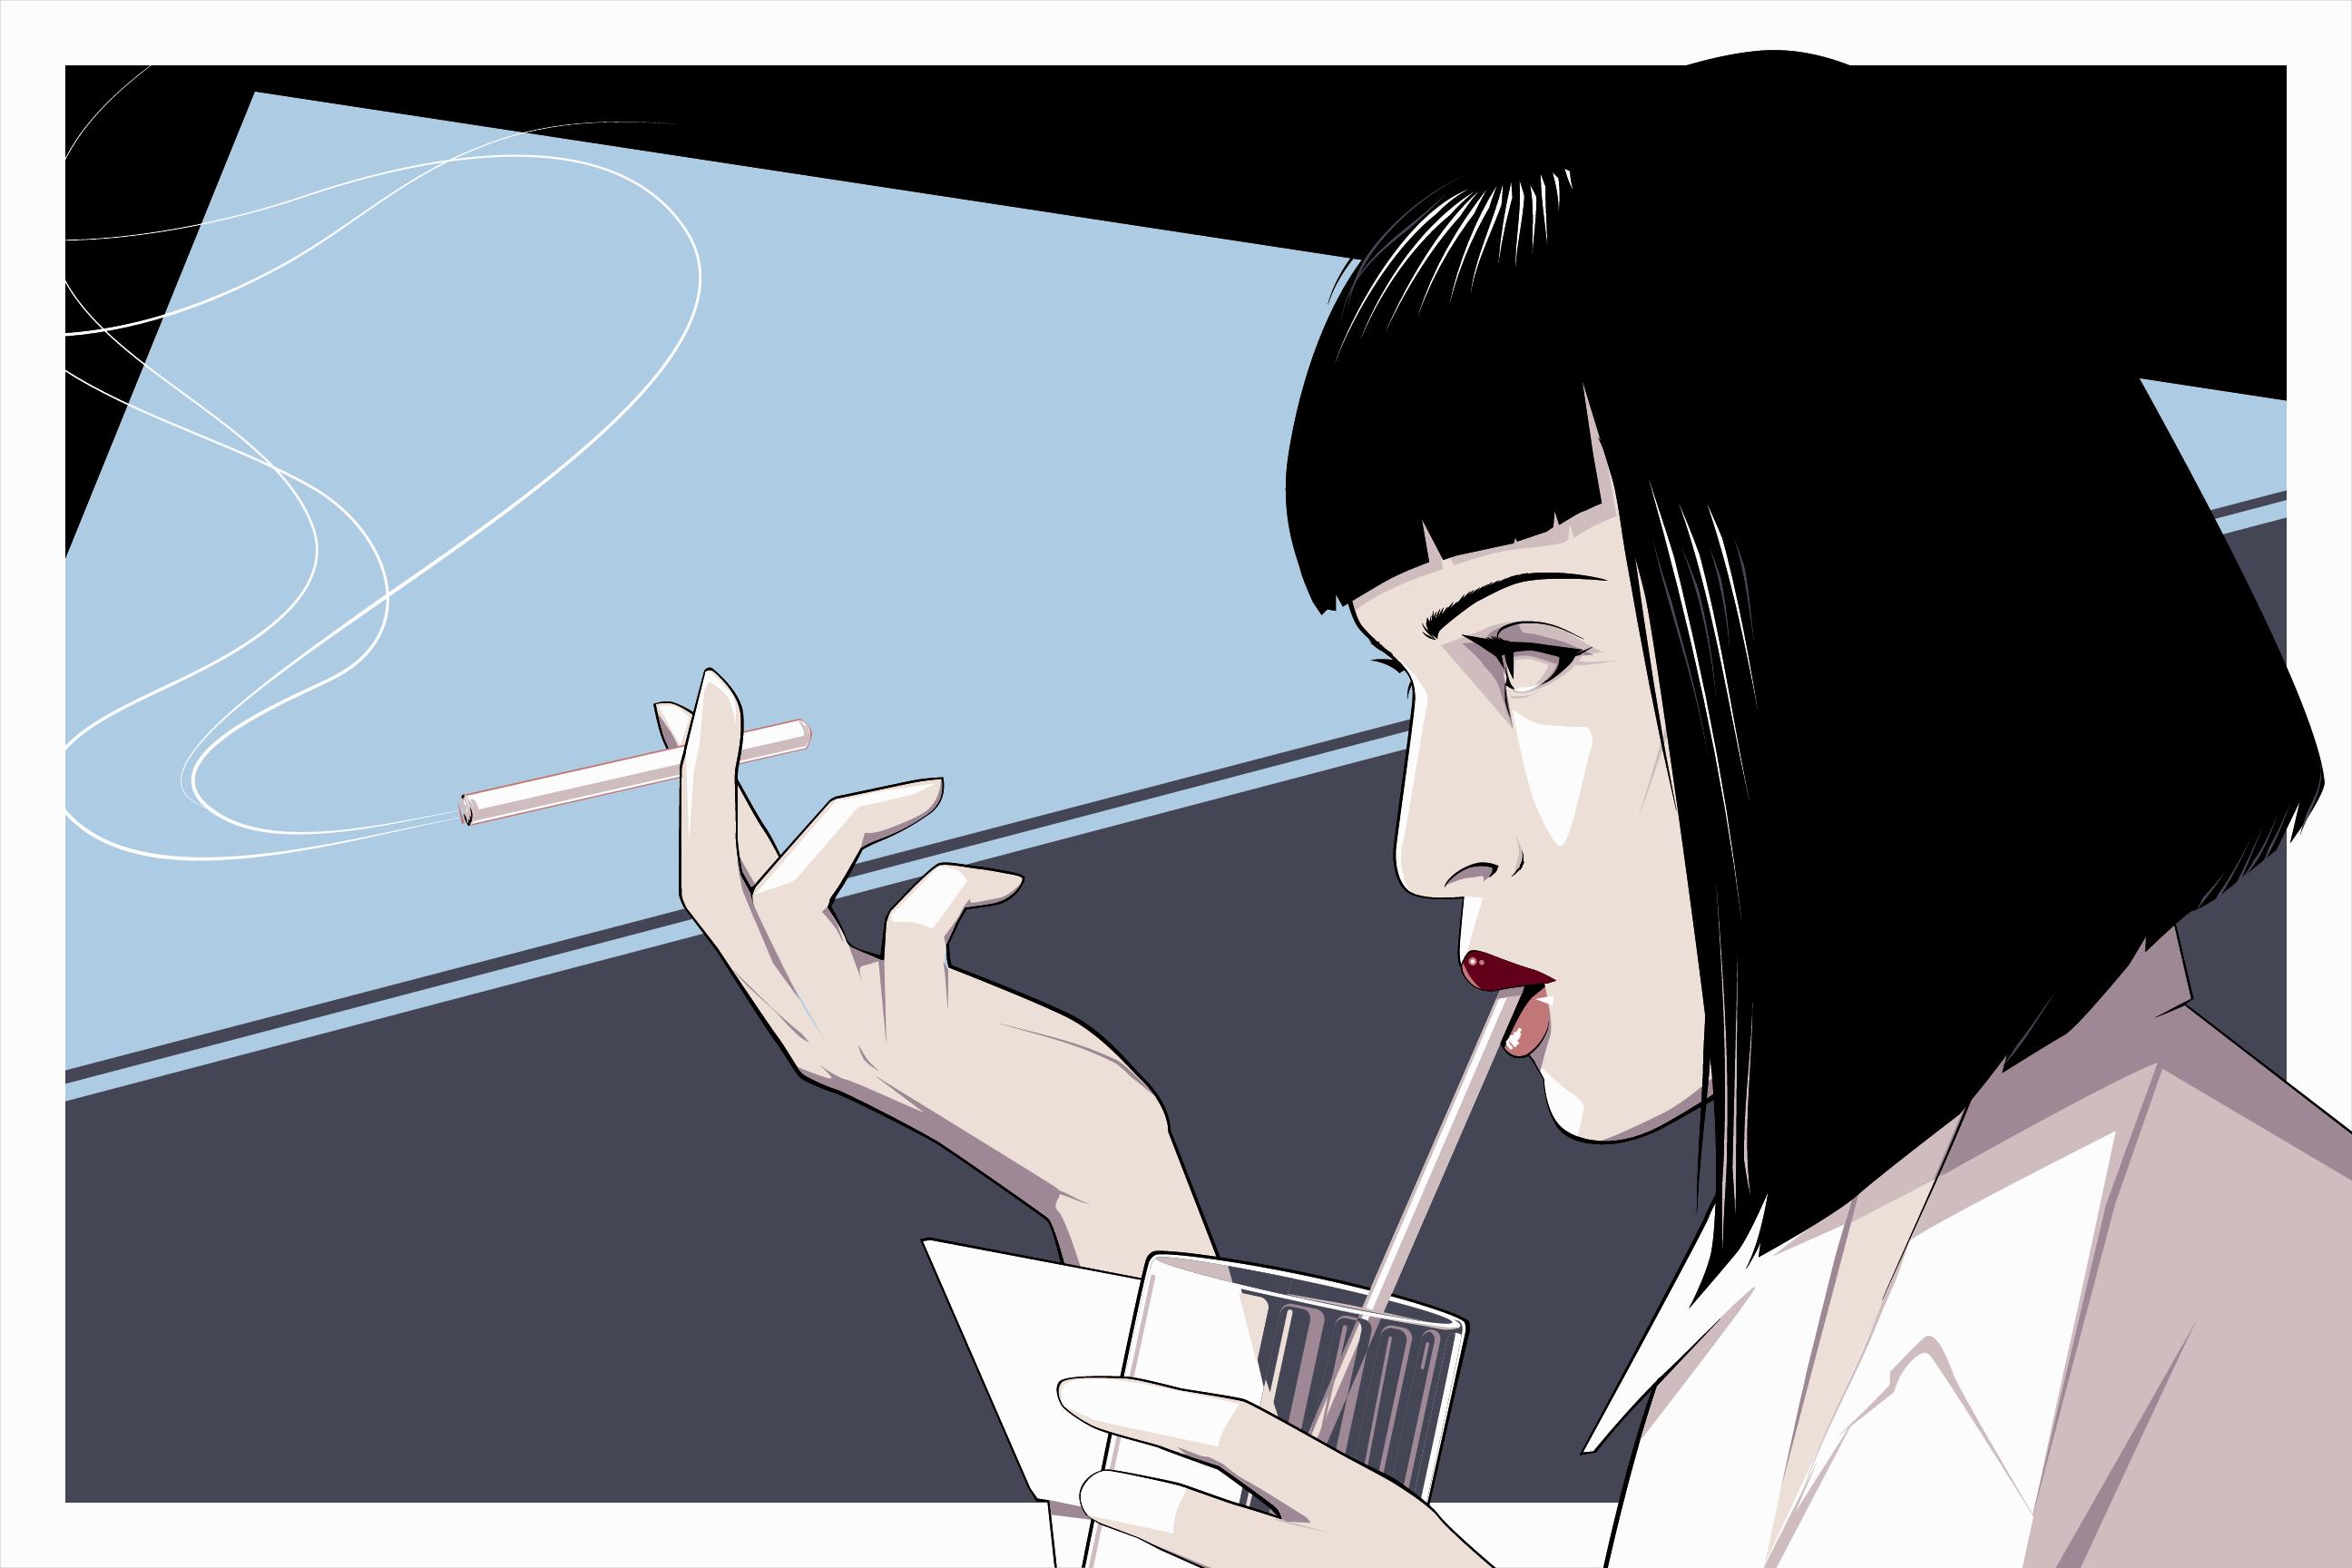 General 2592x1728 Pulp Fiction Uma Thurman Craig Drake Mia Wallace cigarettes fan art movies